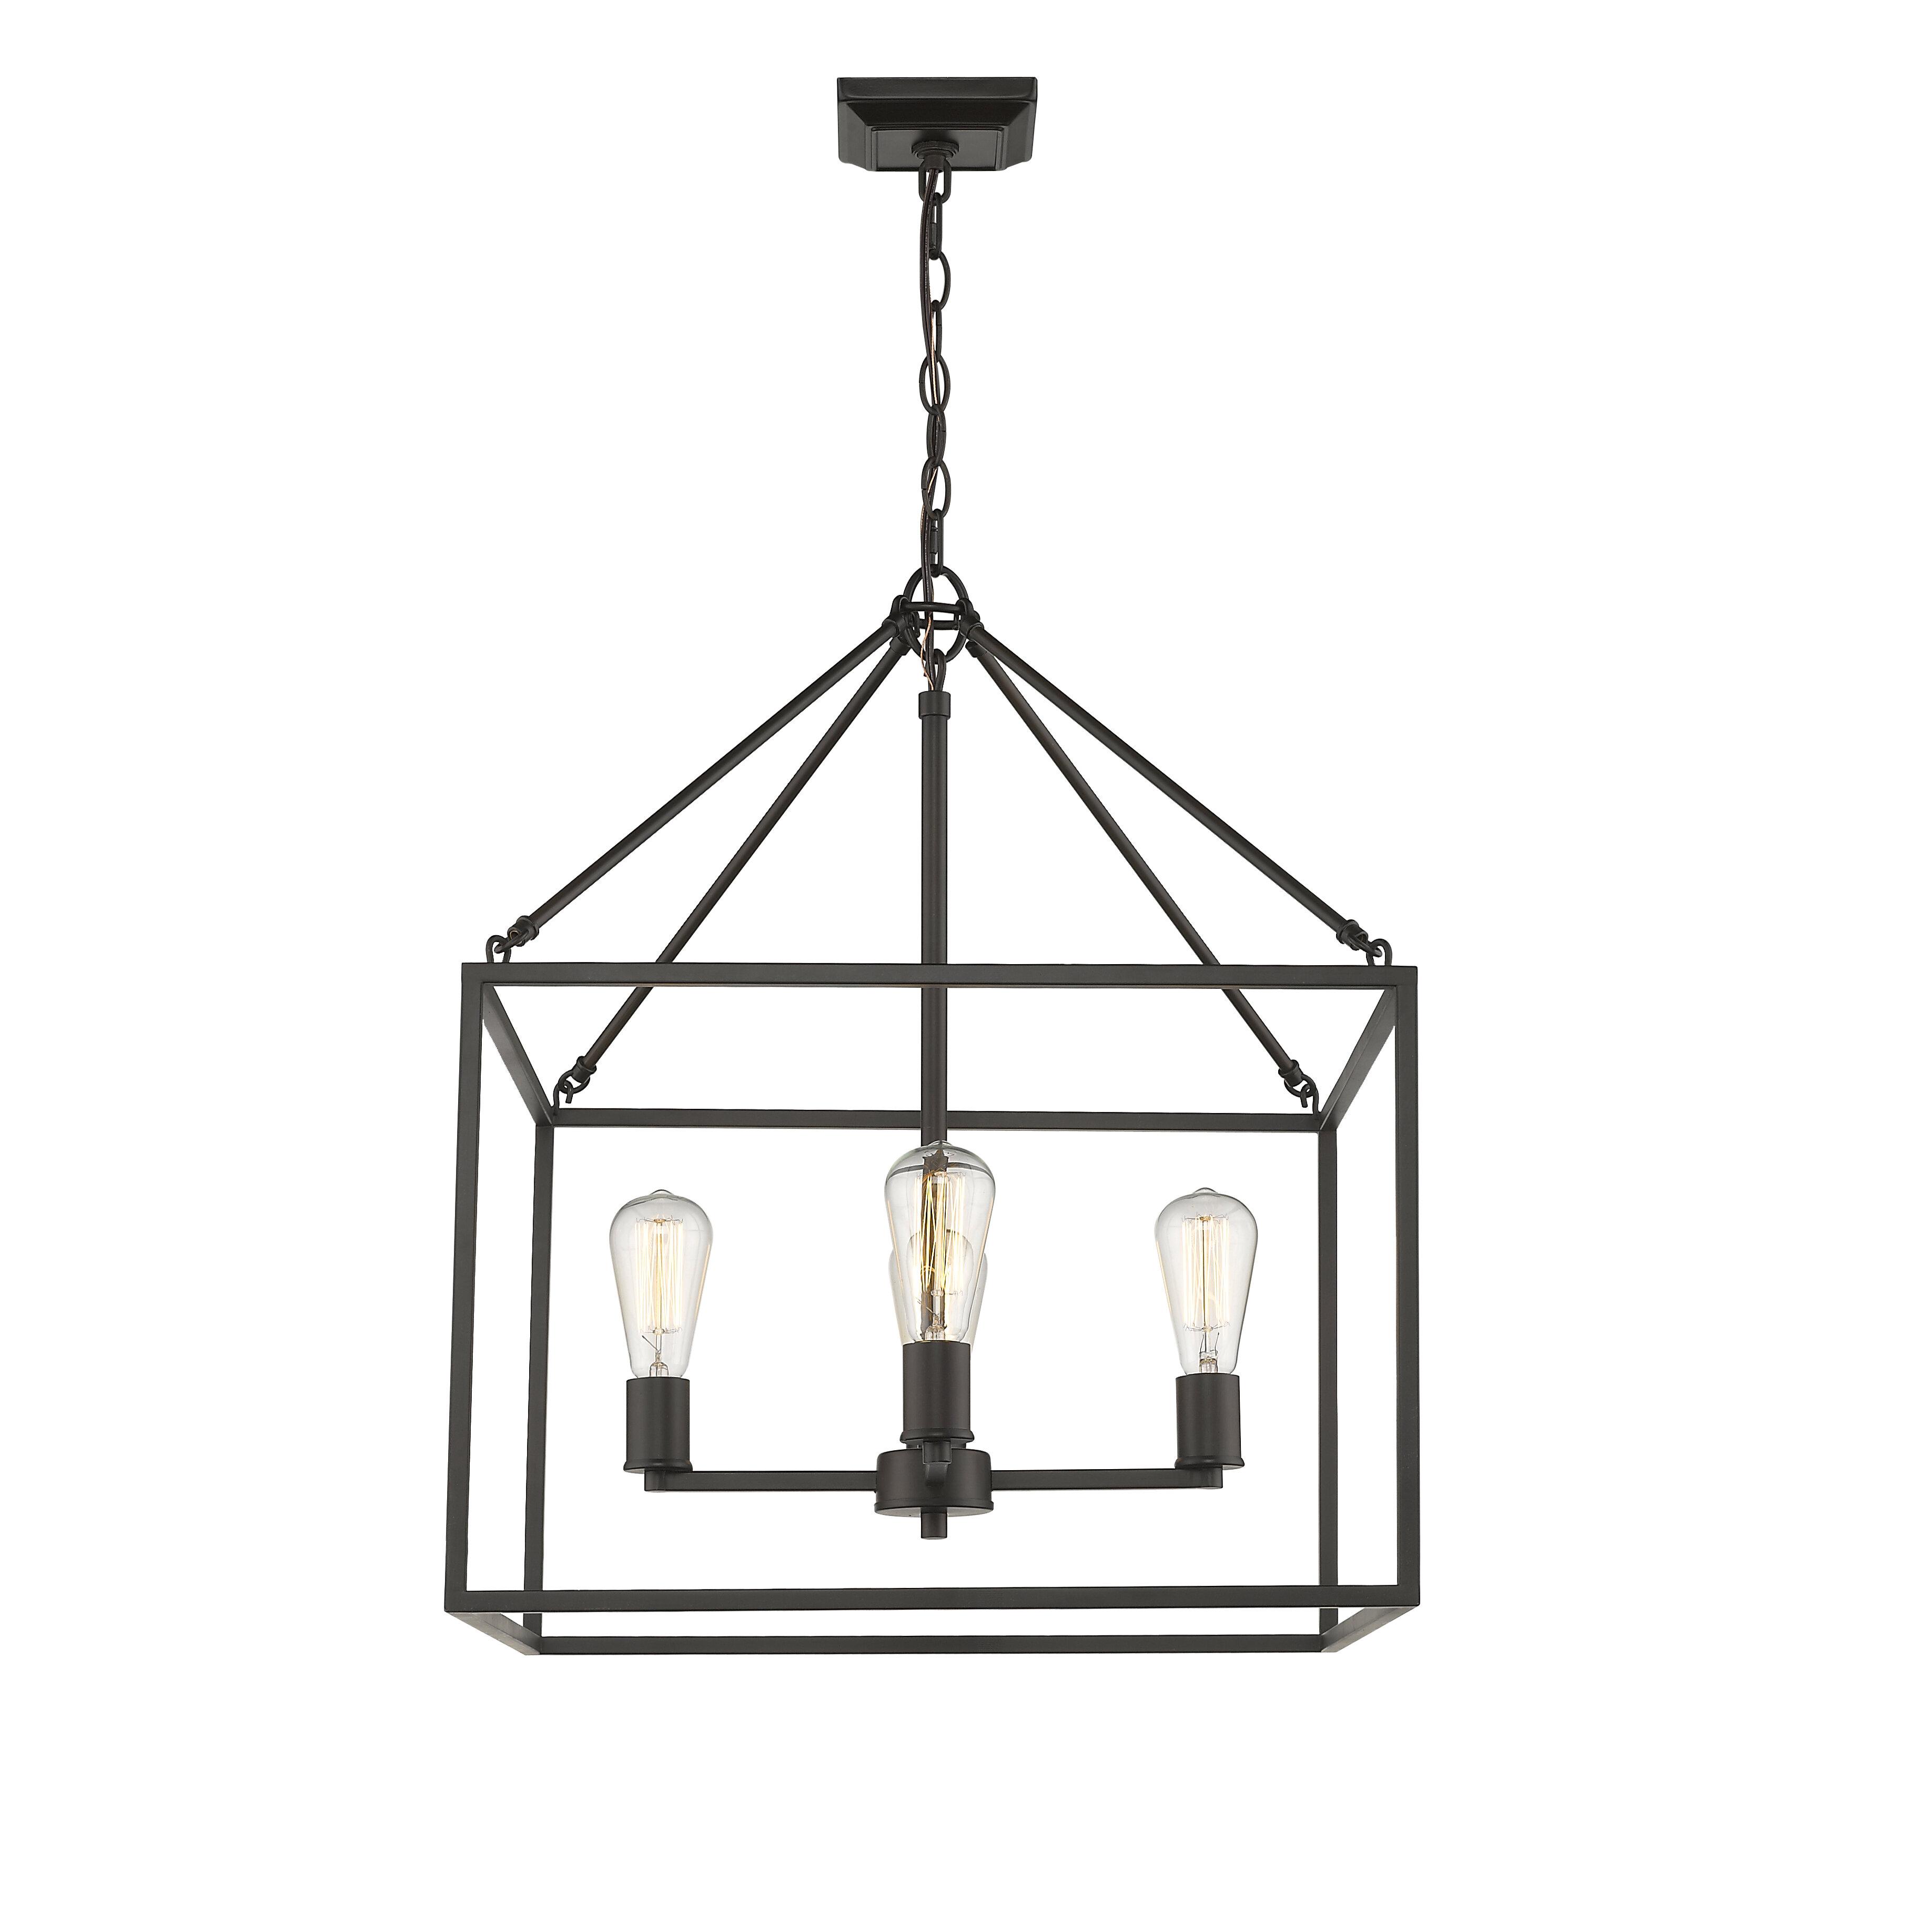 Zabel 4 Light Lantern Square / Rectangle Pendant Pertaining To Carmen 8 Light Lantern Tiered Pendants (View 19 of 30)